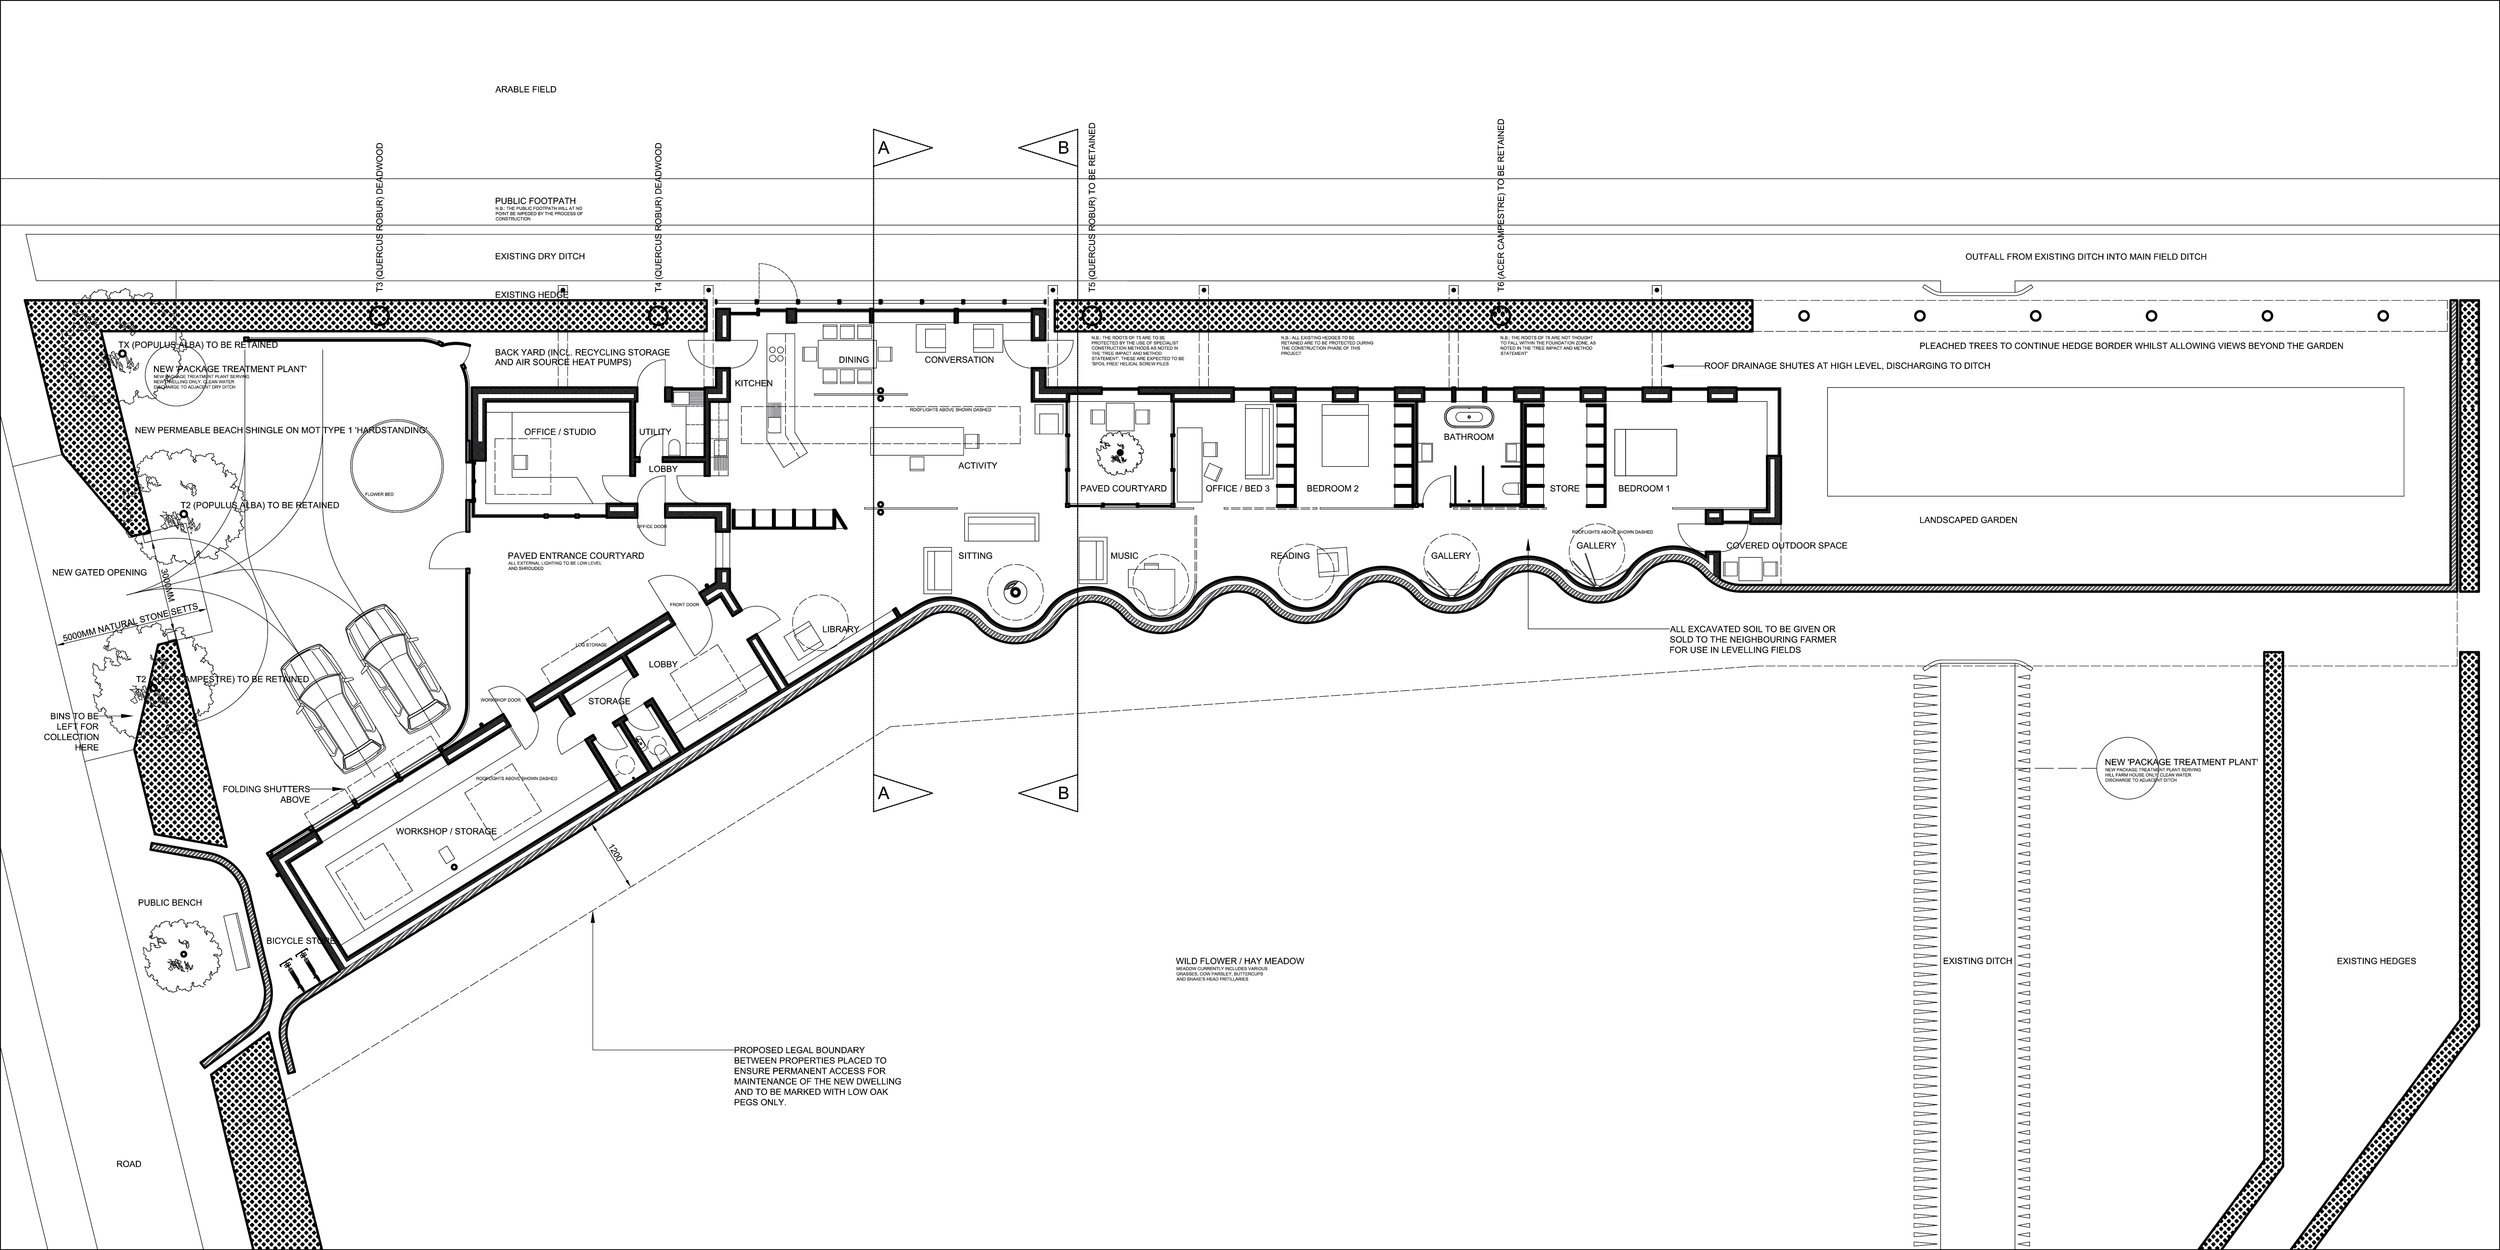 Monewden, Suffolk: Proposed Dwelling, Plan